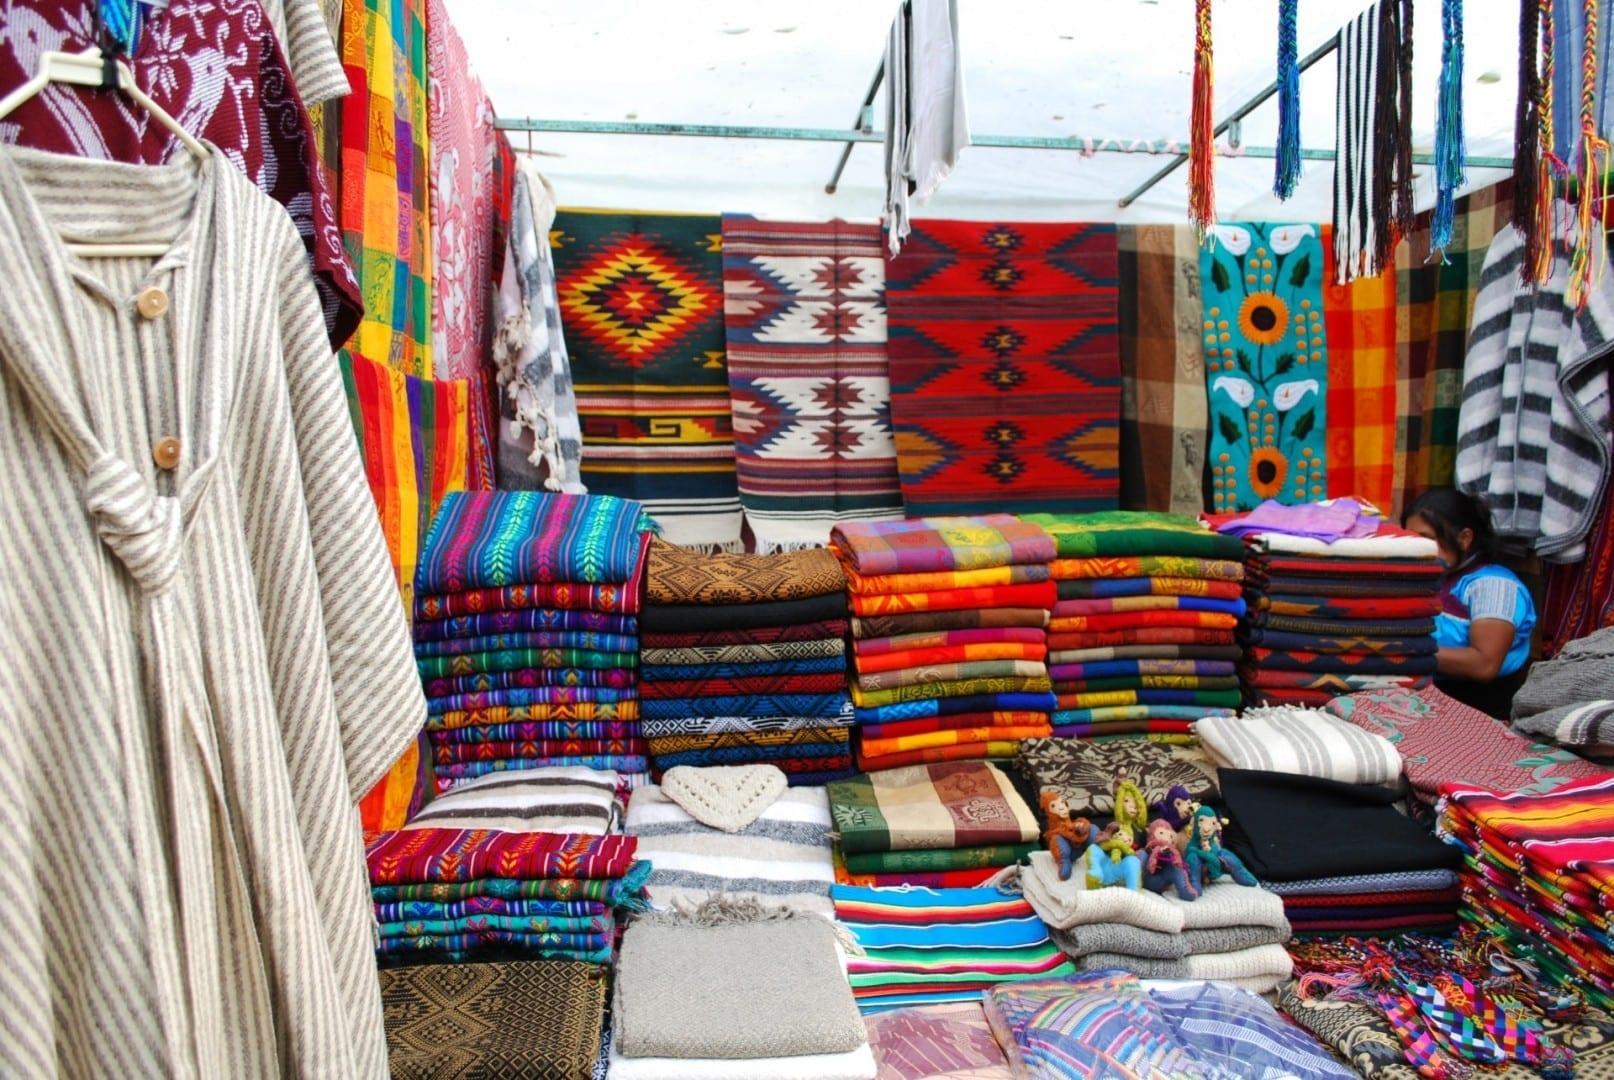 Textiles en venta frente al Templo Santo Domingo San Cristobal de las casas México